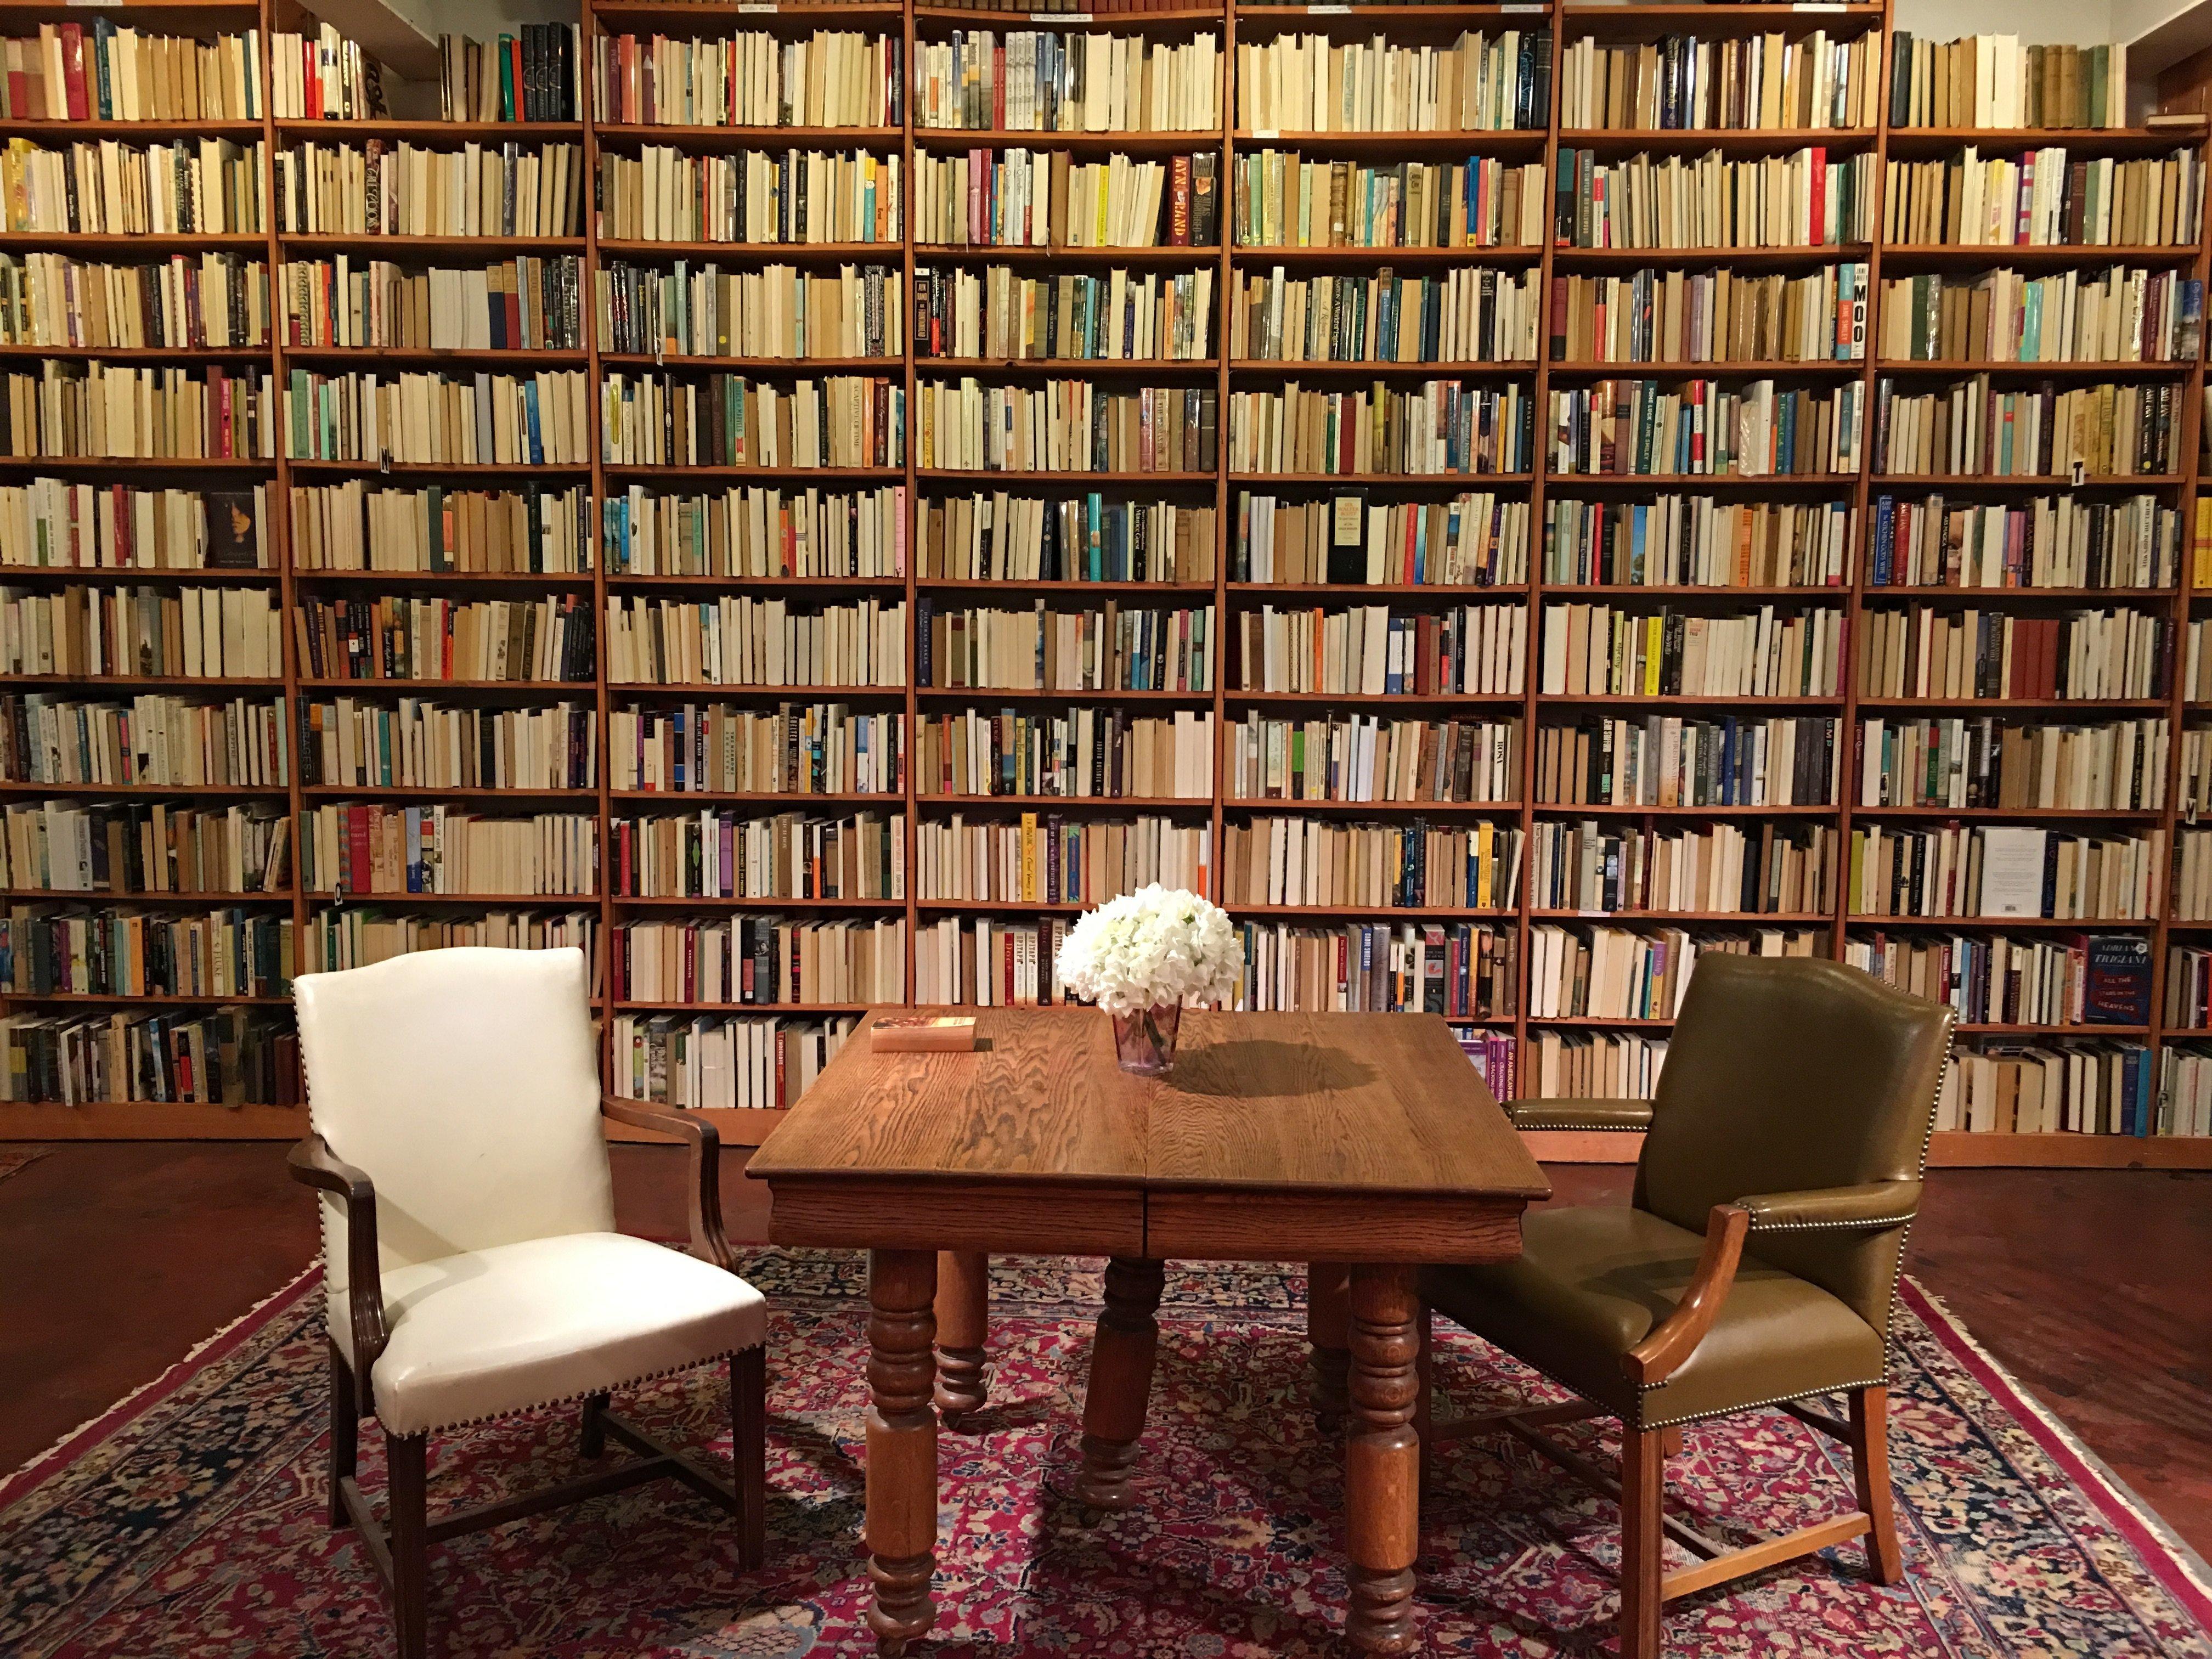 Shelves full of backward spines emphasize the gender imbalance in